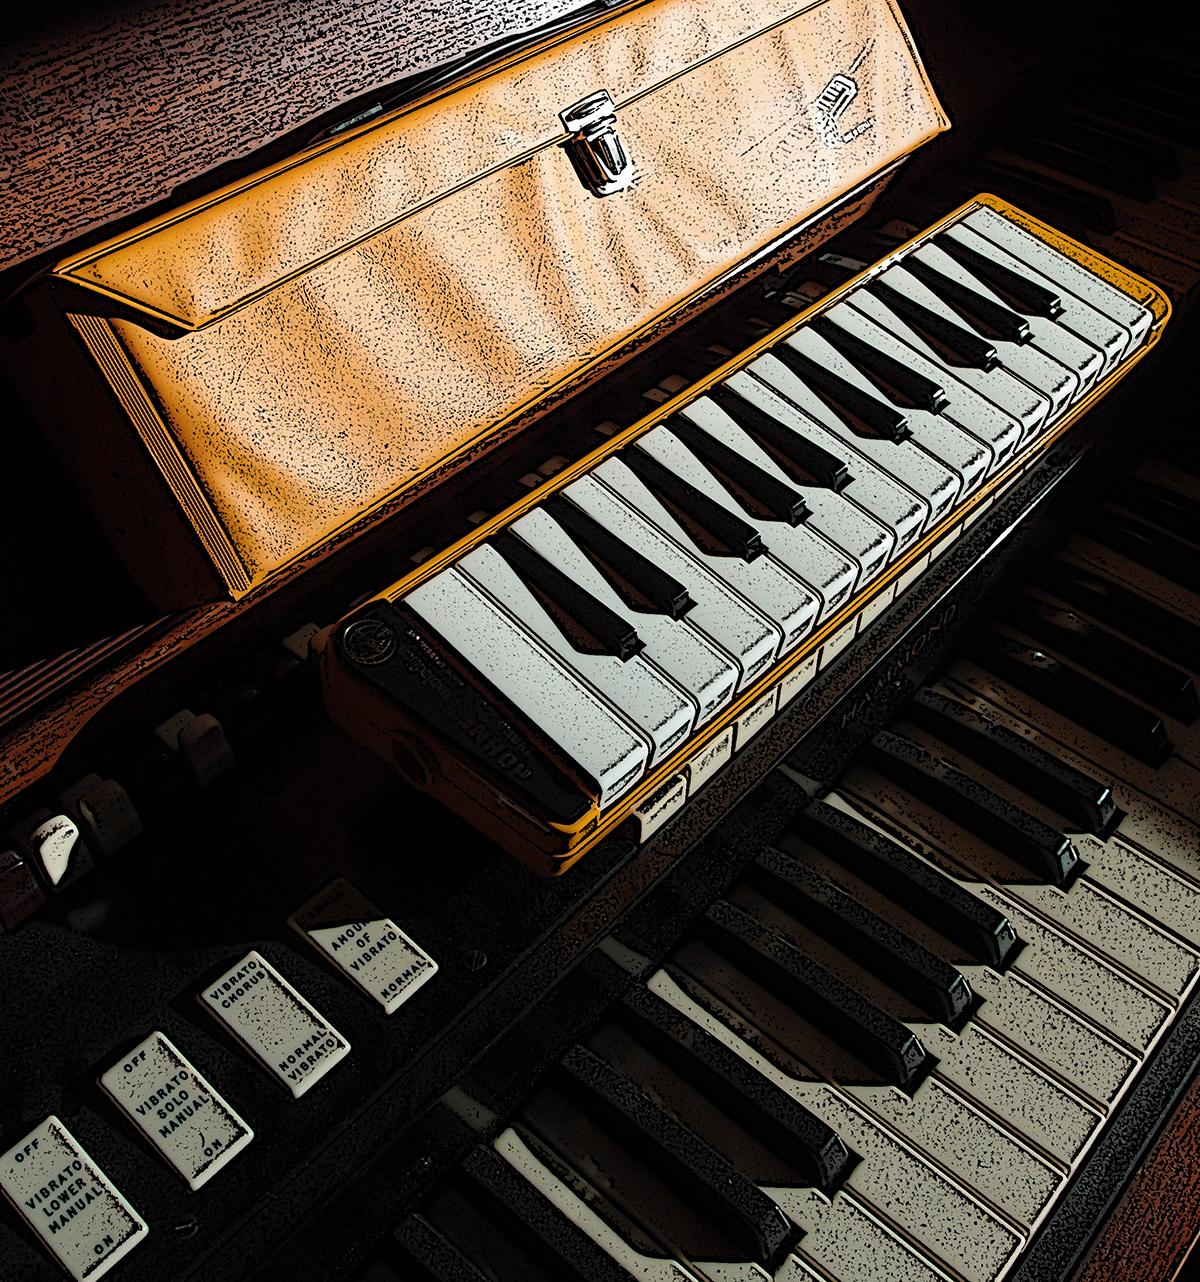 Yellow Melodica and Hammond Organ